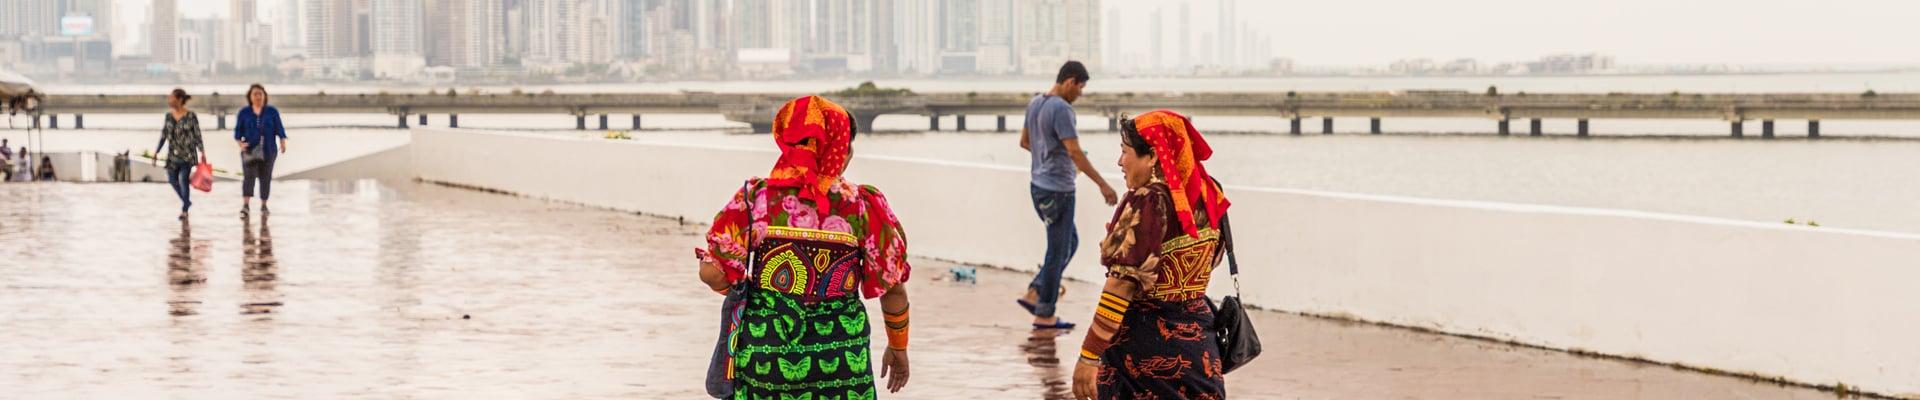 Kuna Yala women in Panama City